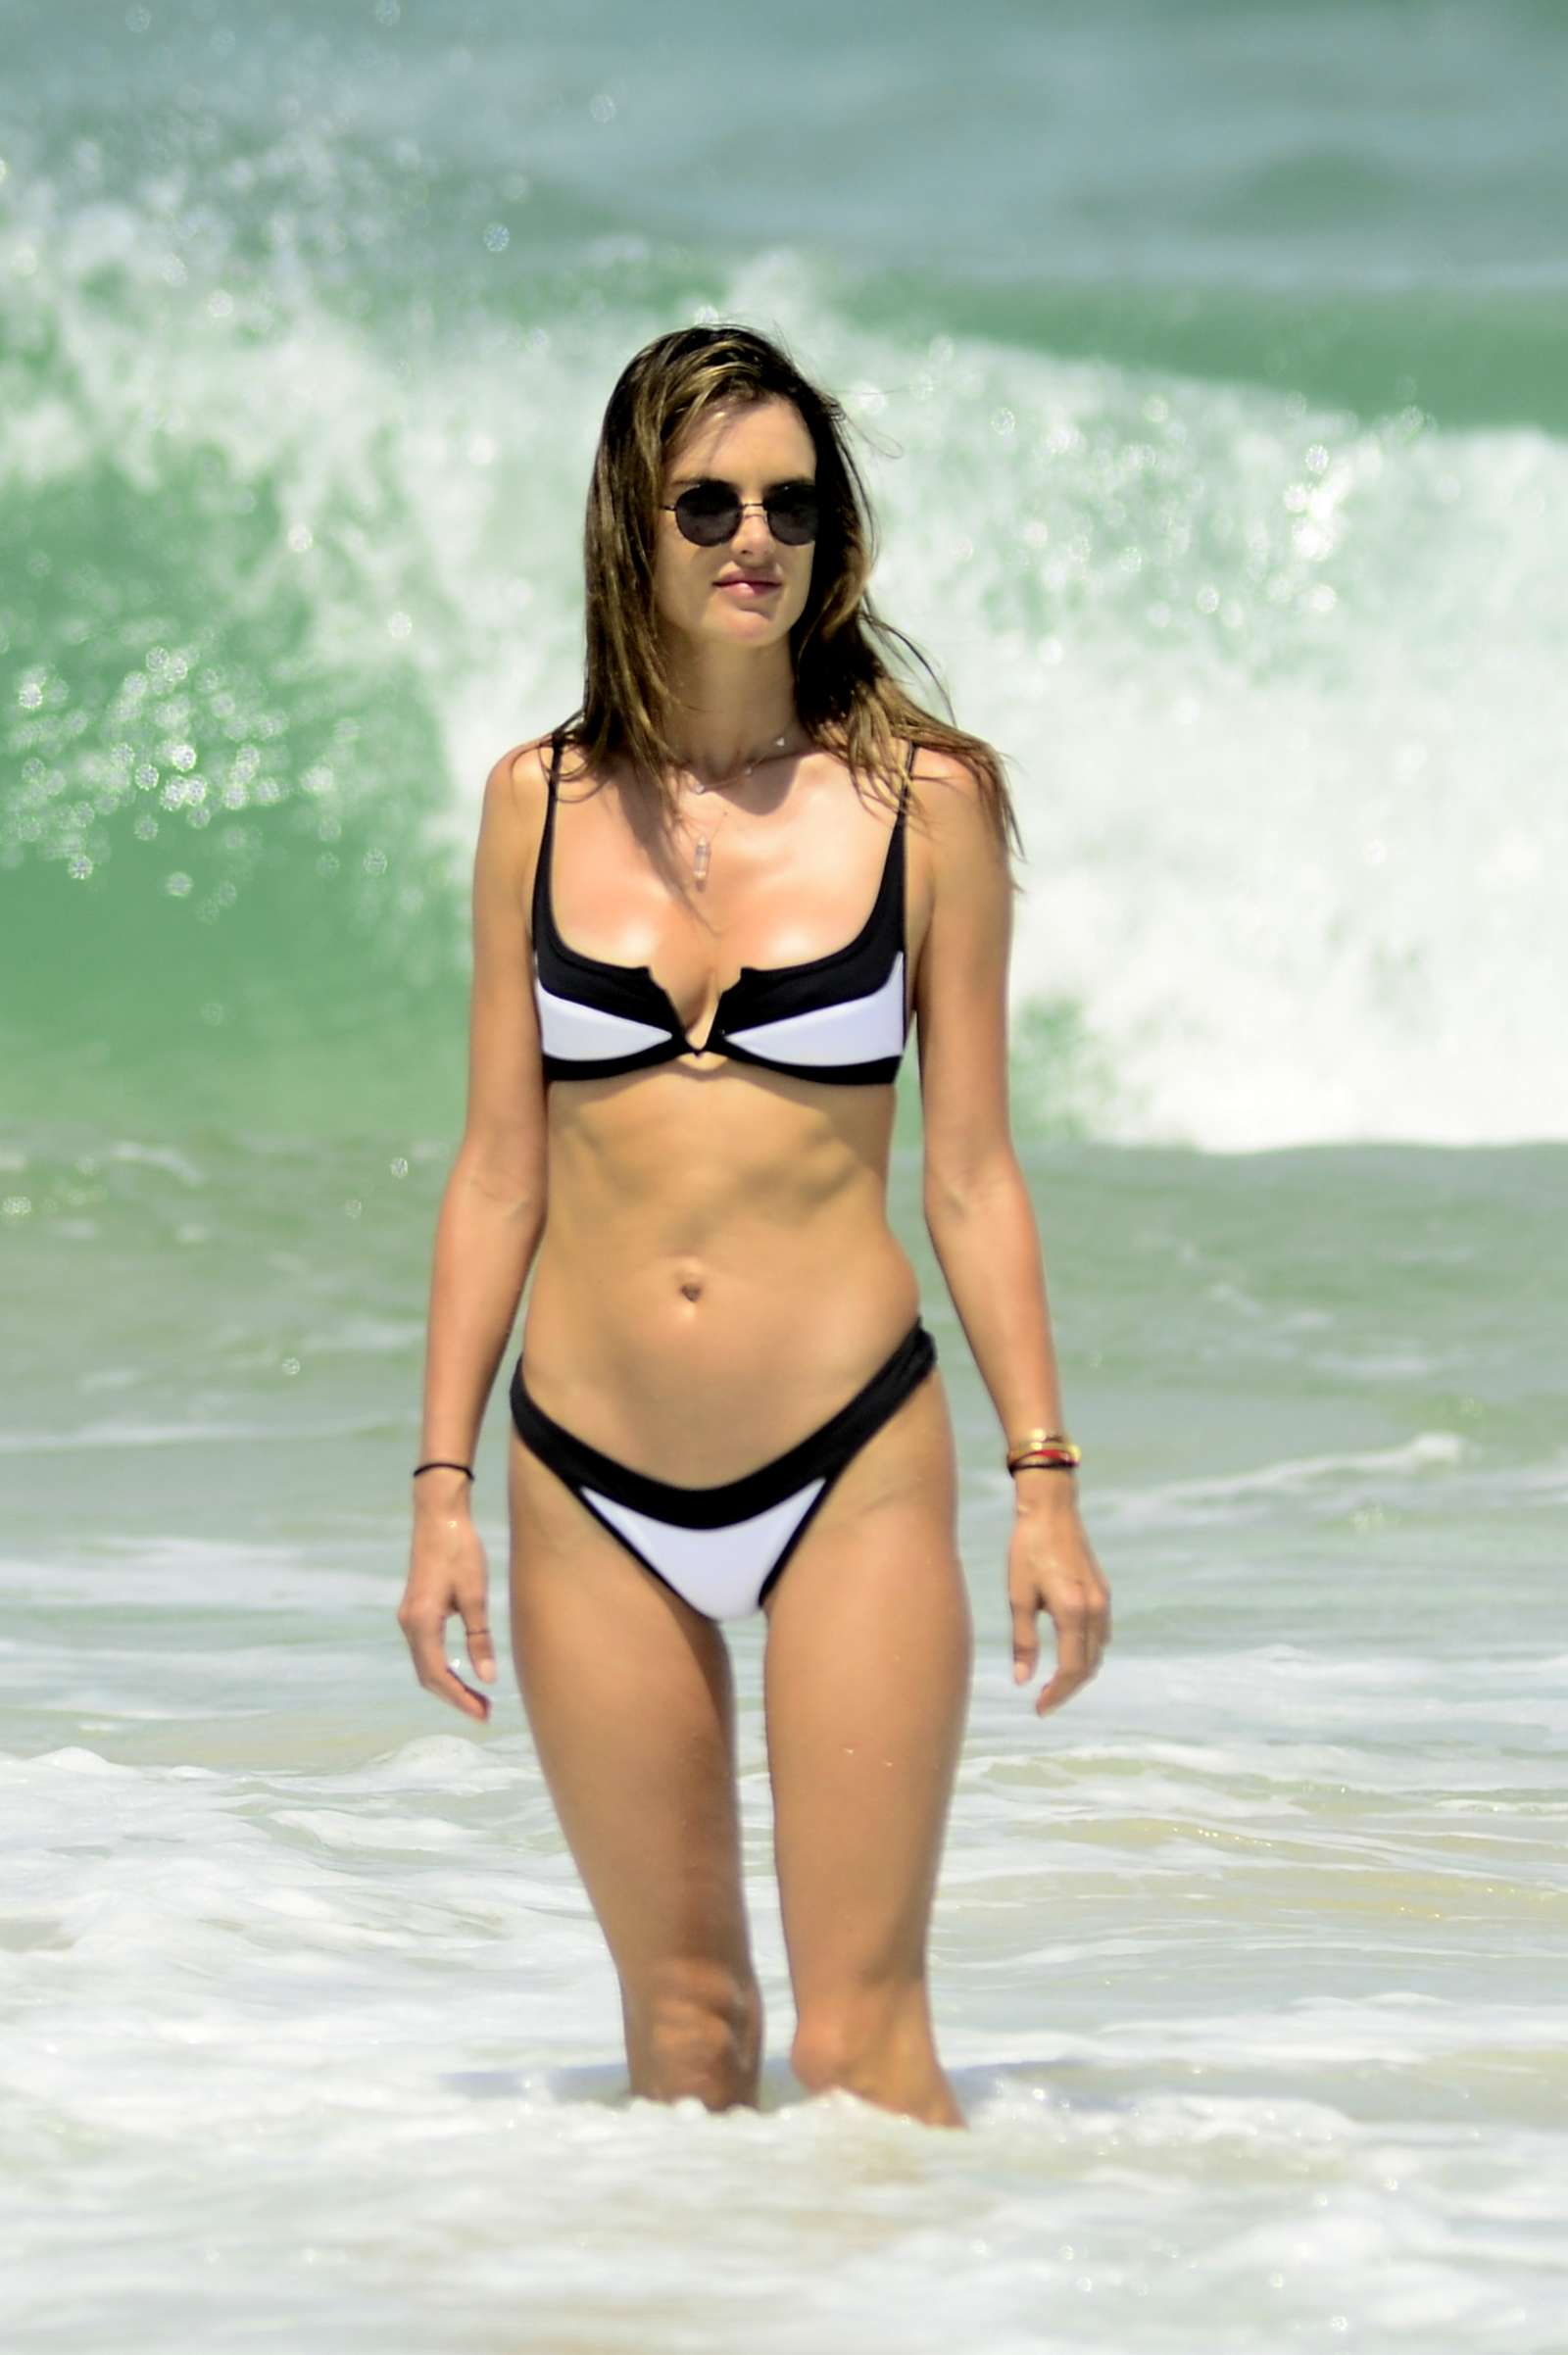 Alessandra Ambrosio in White and Black Bikini on the beach in Florianopolis